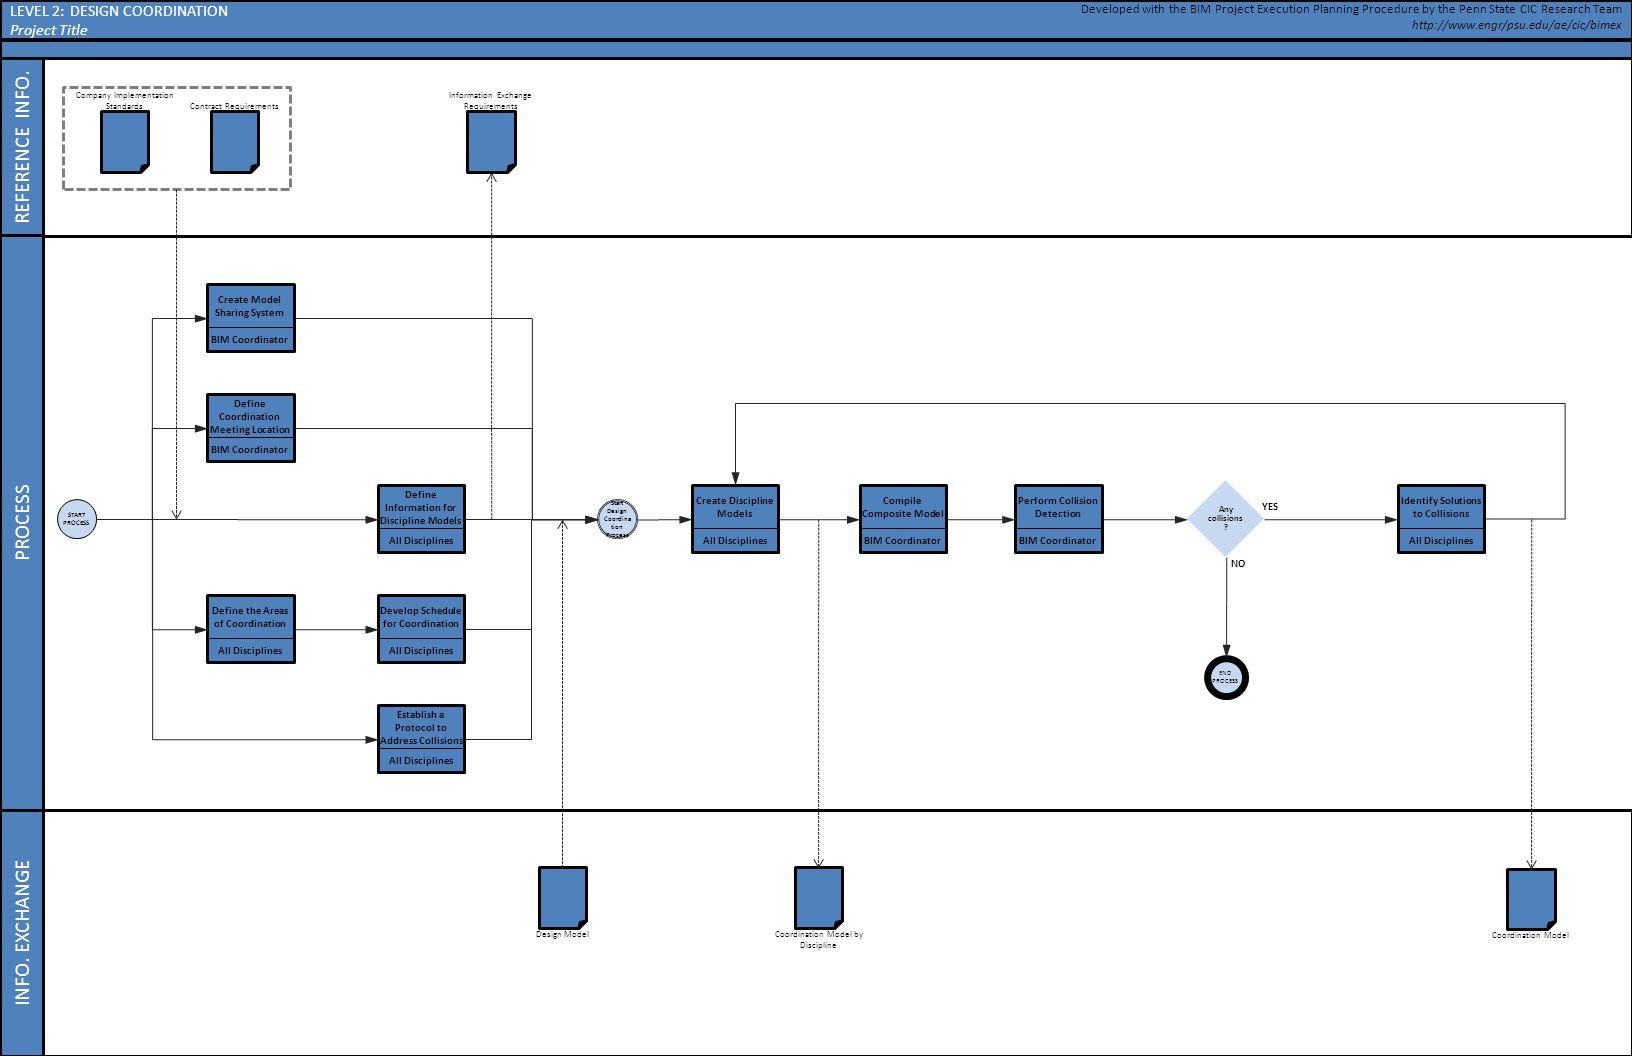 Design coordination BIM Coordinator Create Model Sharing System